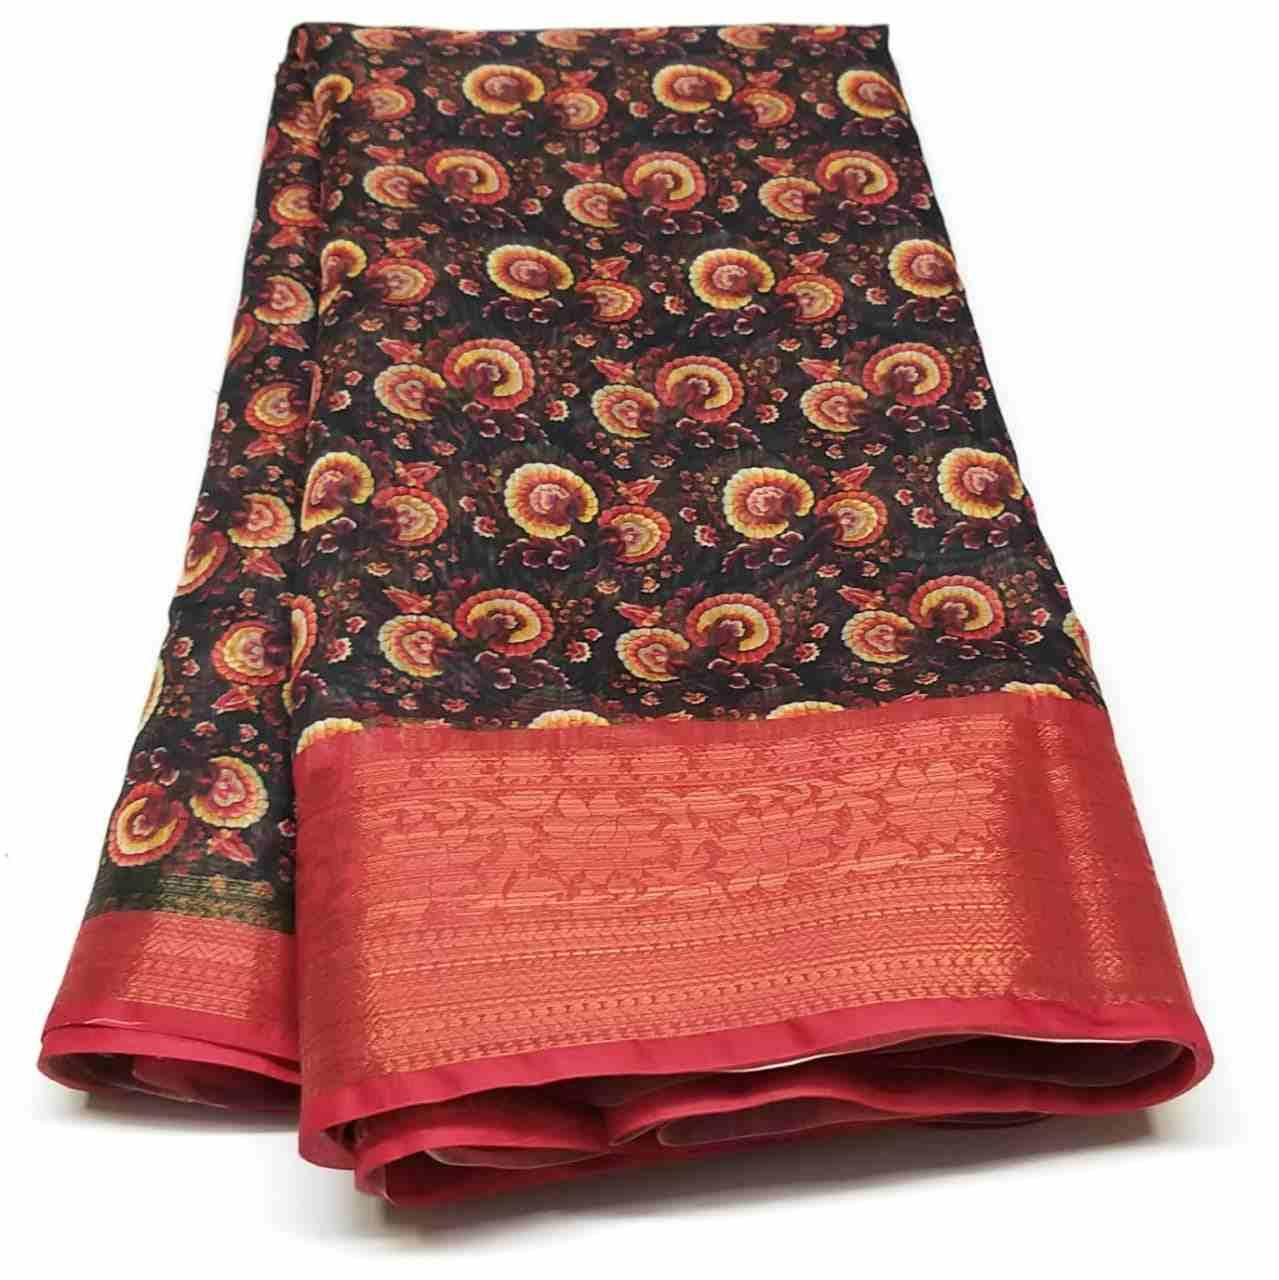 Rambha-2 Orange Cotton Saree